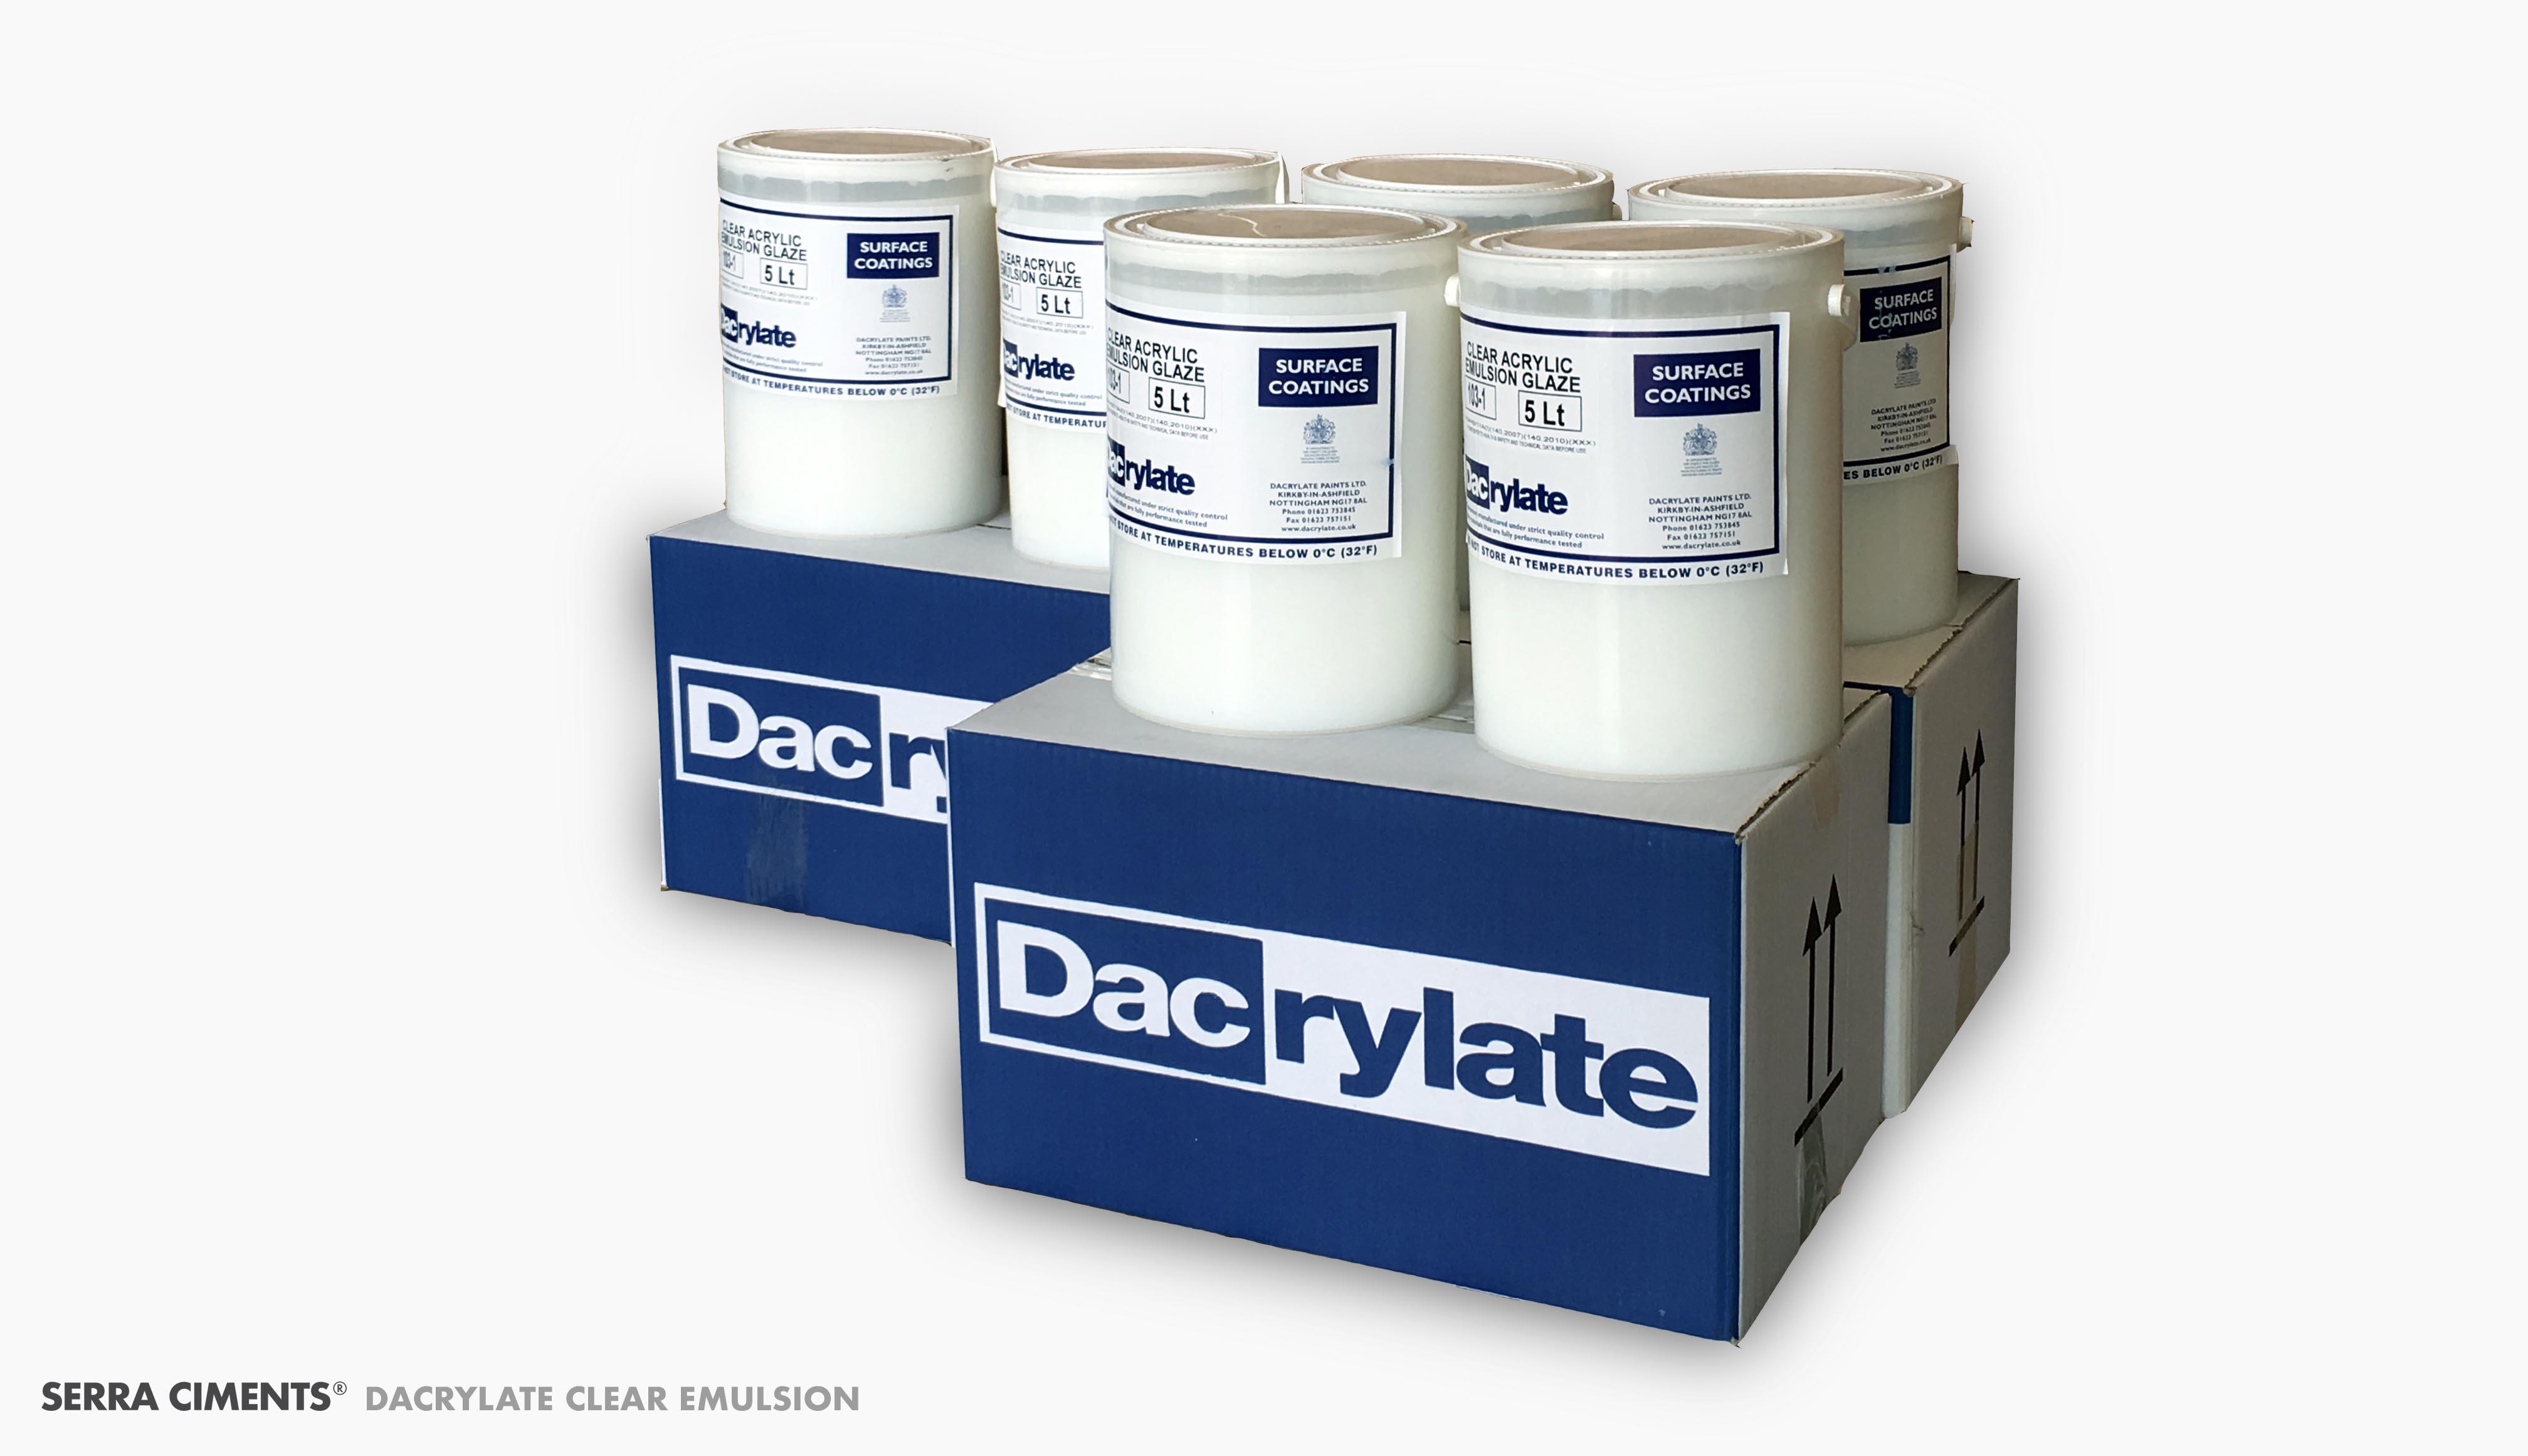 dacrylate clear emulsion